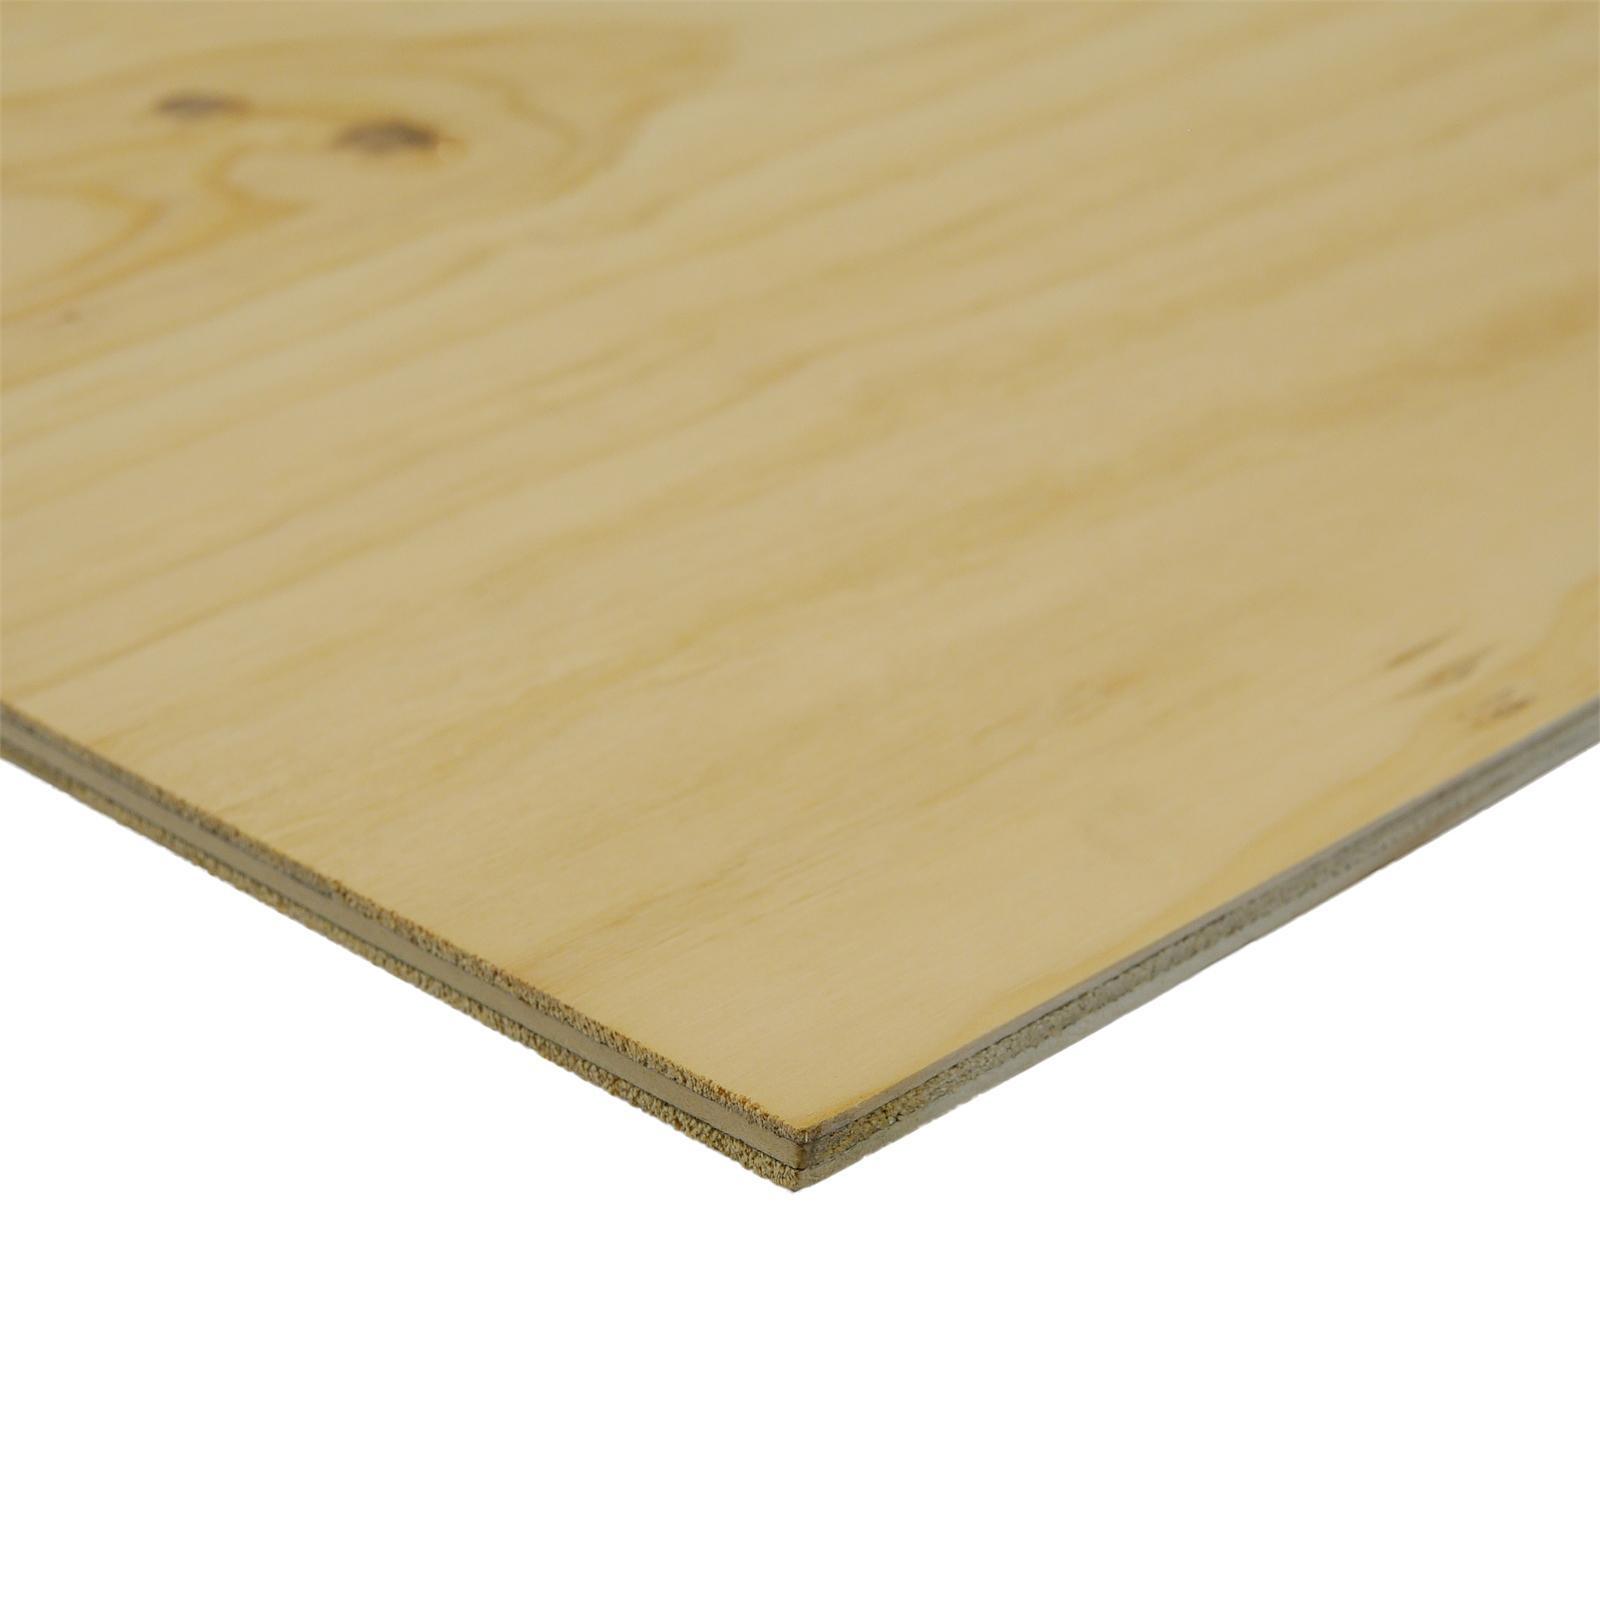 IBS Mini Panels 1200 x 600 x 7mm Untreated CD Plywood